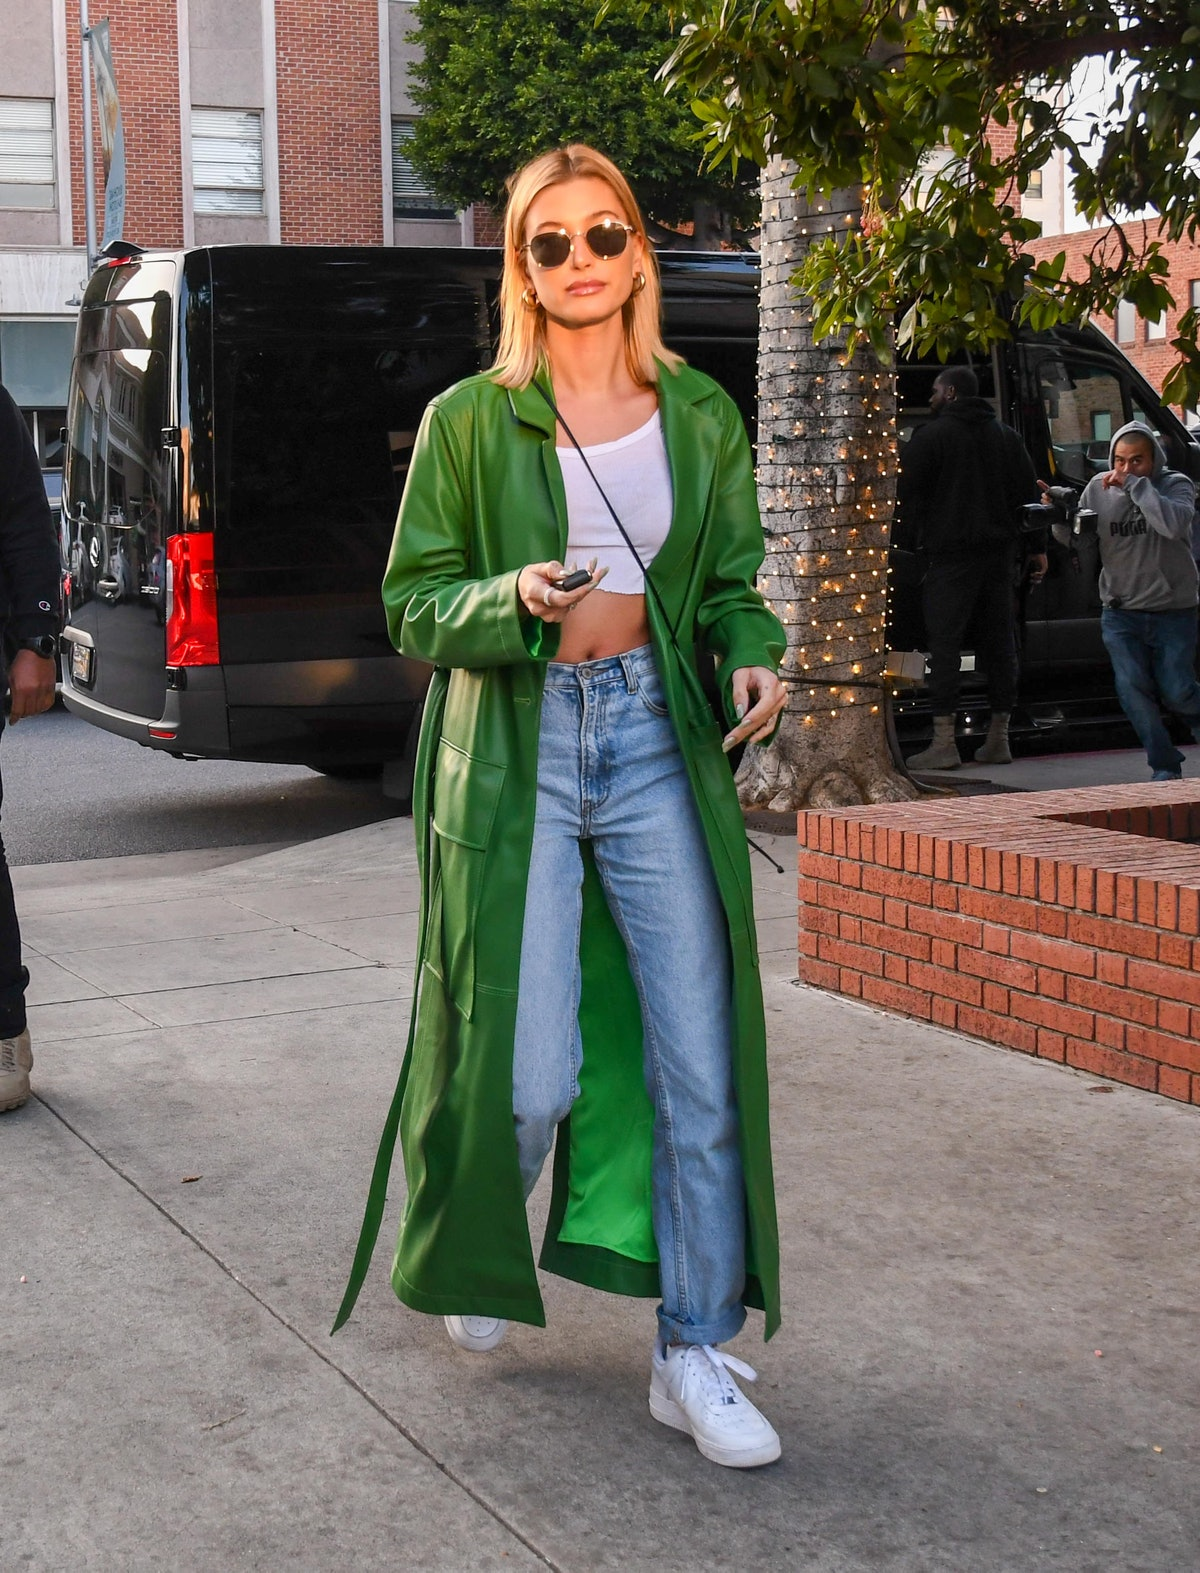 Hailey Rhode Bieber is seen on February 18, 2020 in Los Angeles, California.